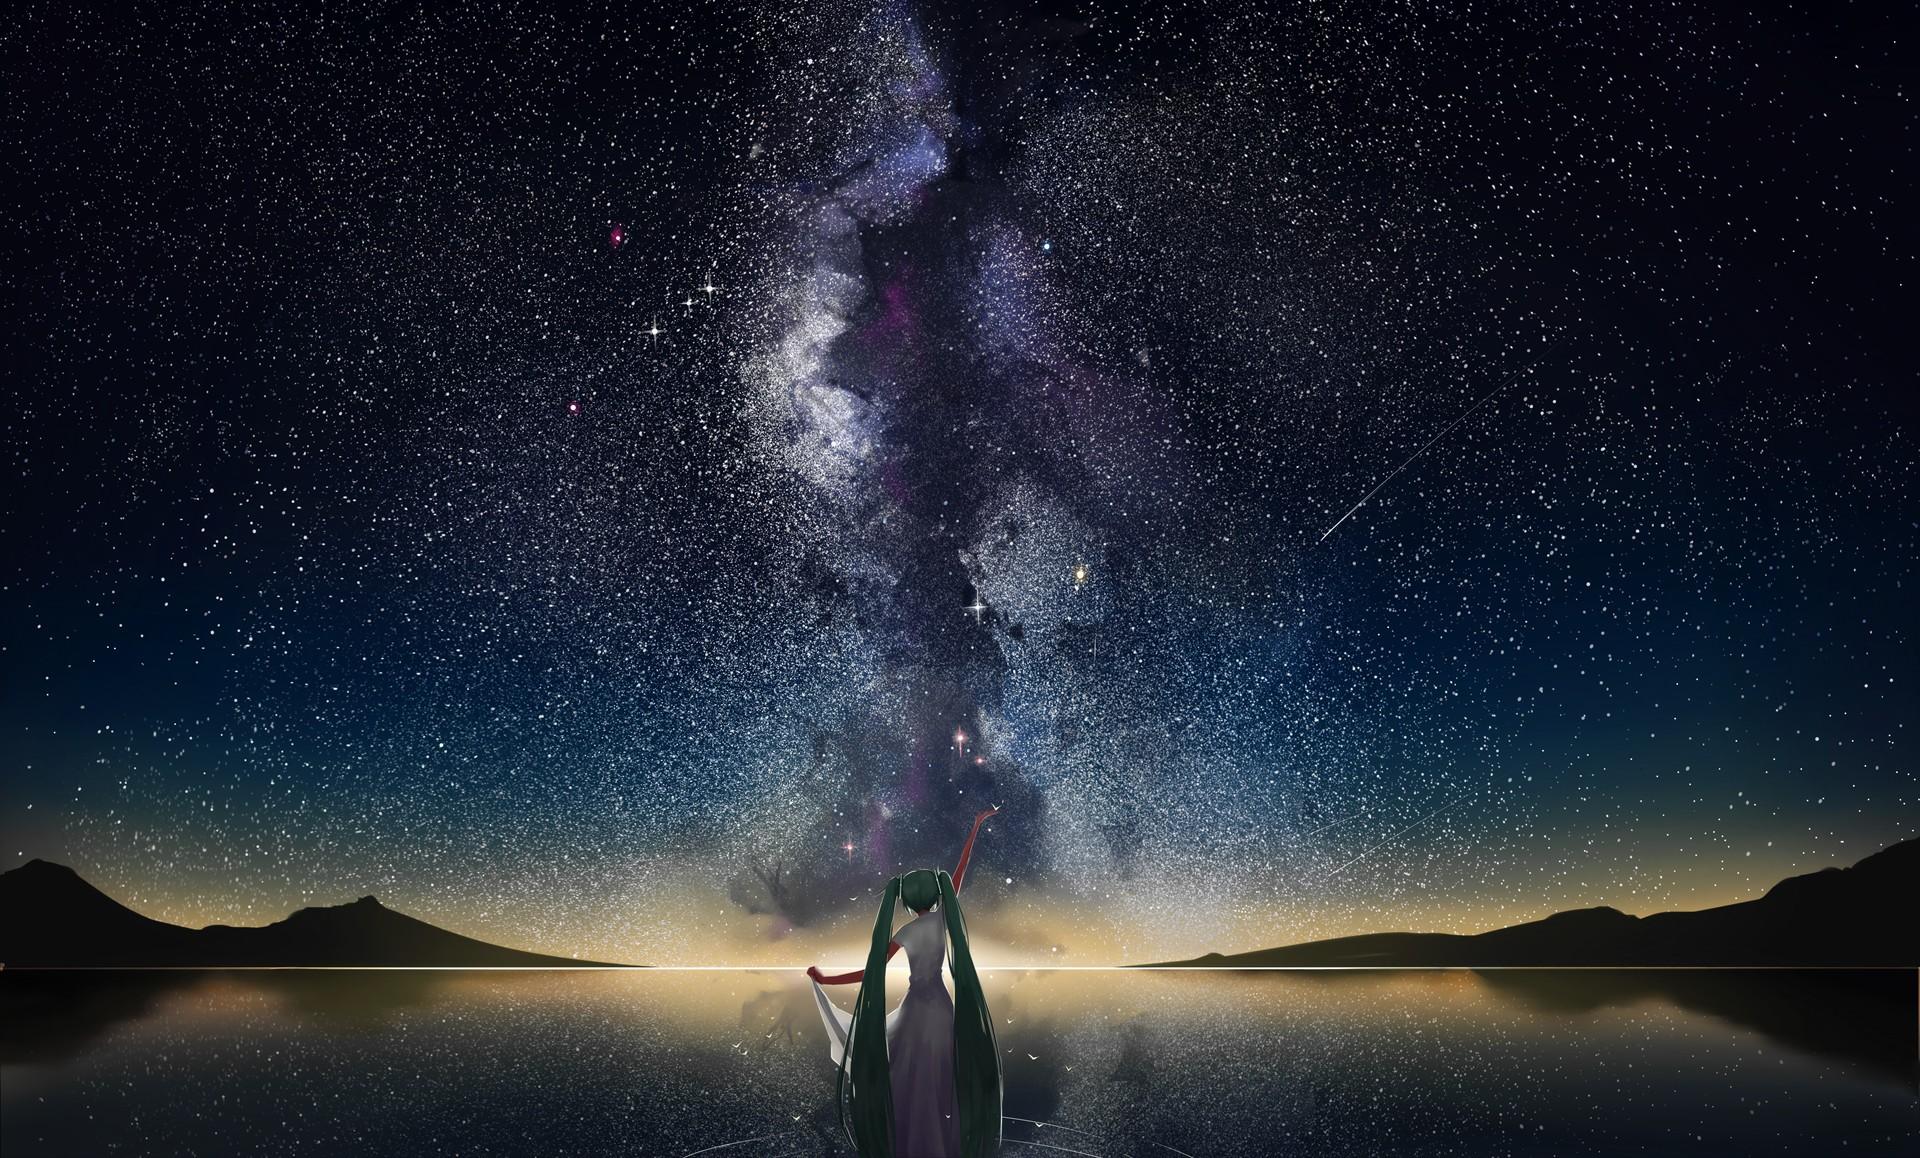 General 1920x1158 space mountains horizon stars shooting stars lake Hatsune Miku starry night green hair long hair sky women outdoors